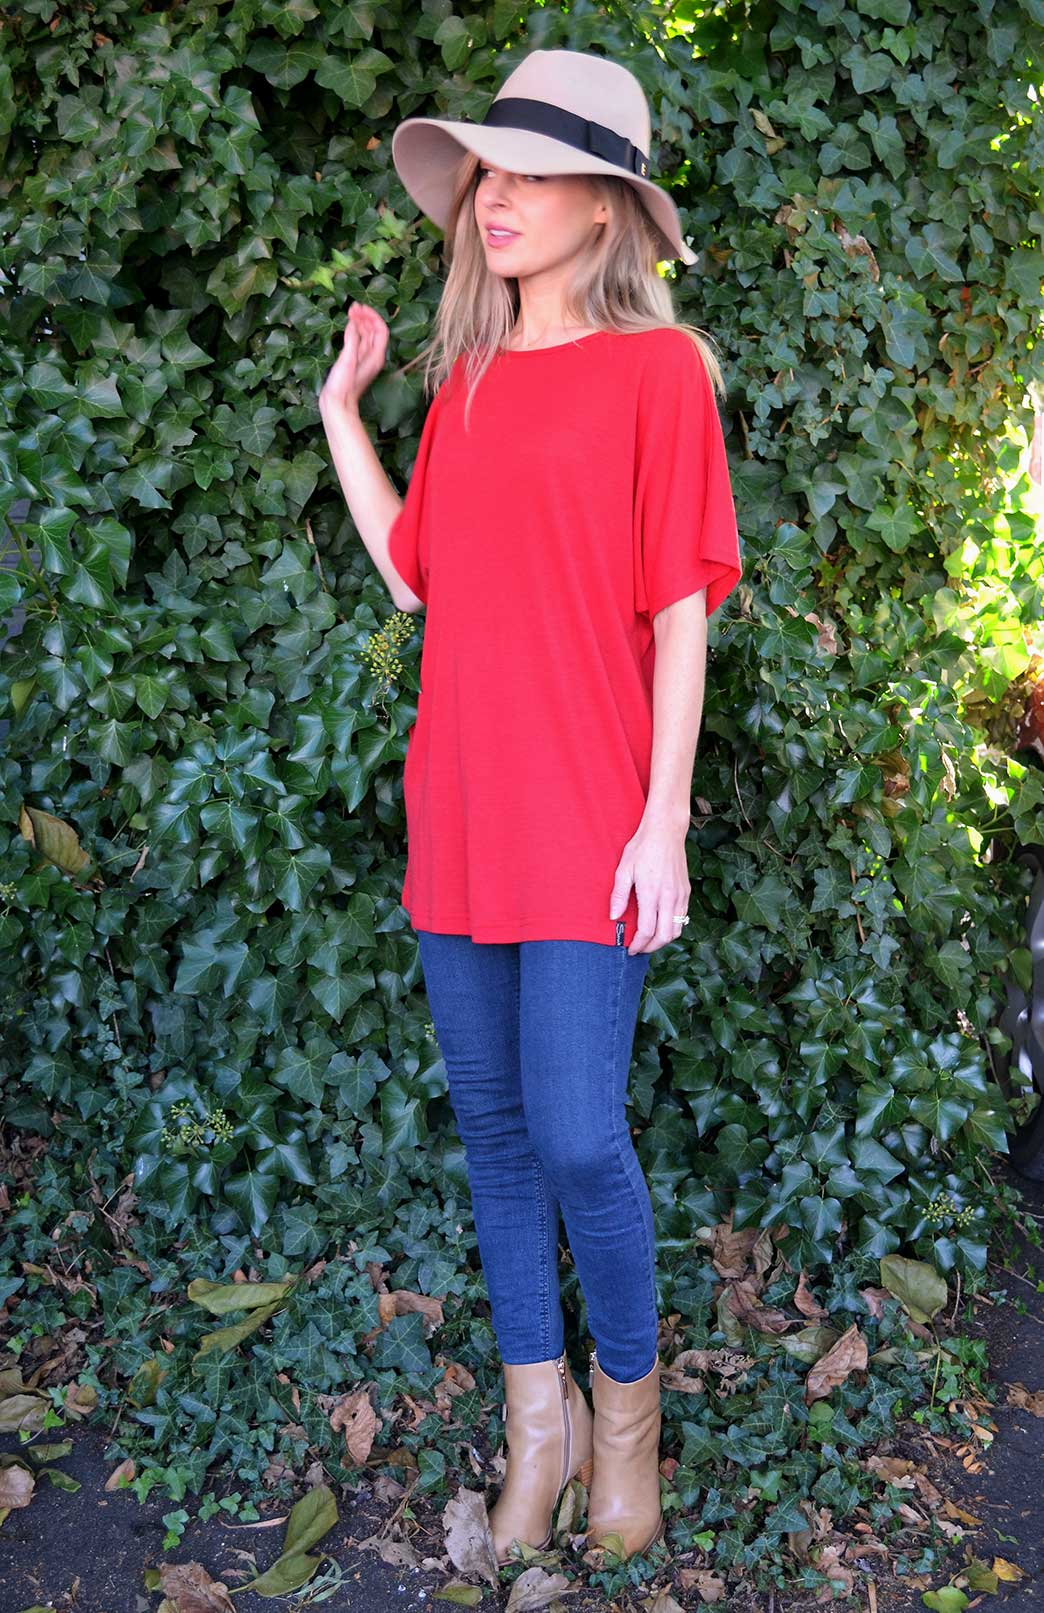 Loose T-Shirt - Women's Loose Wool Red Summer Top - Smitten Merino Tasmania Australia